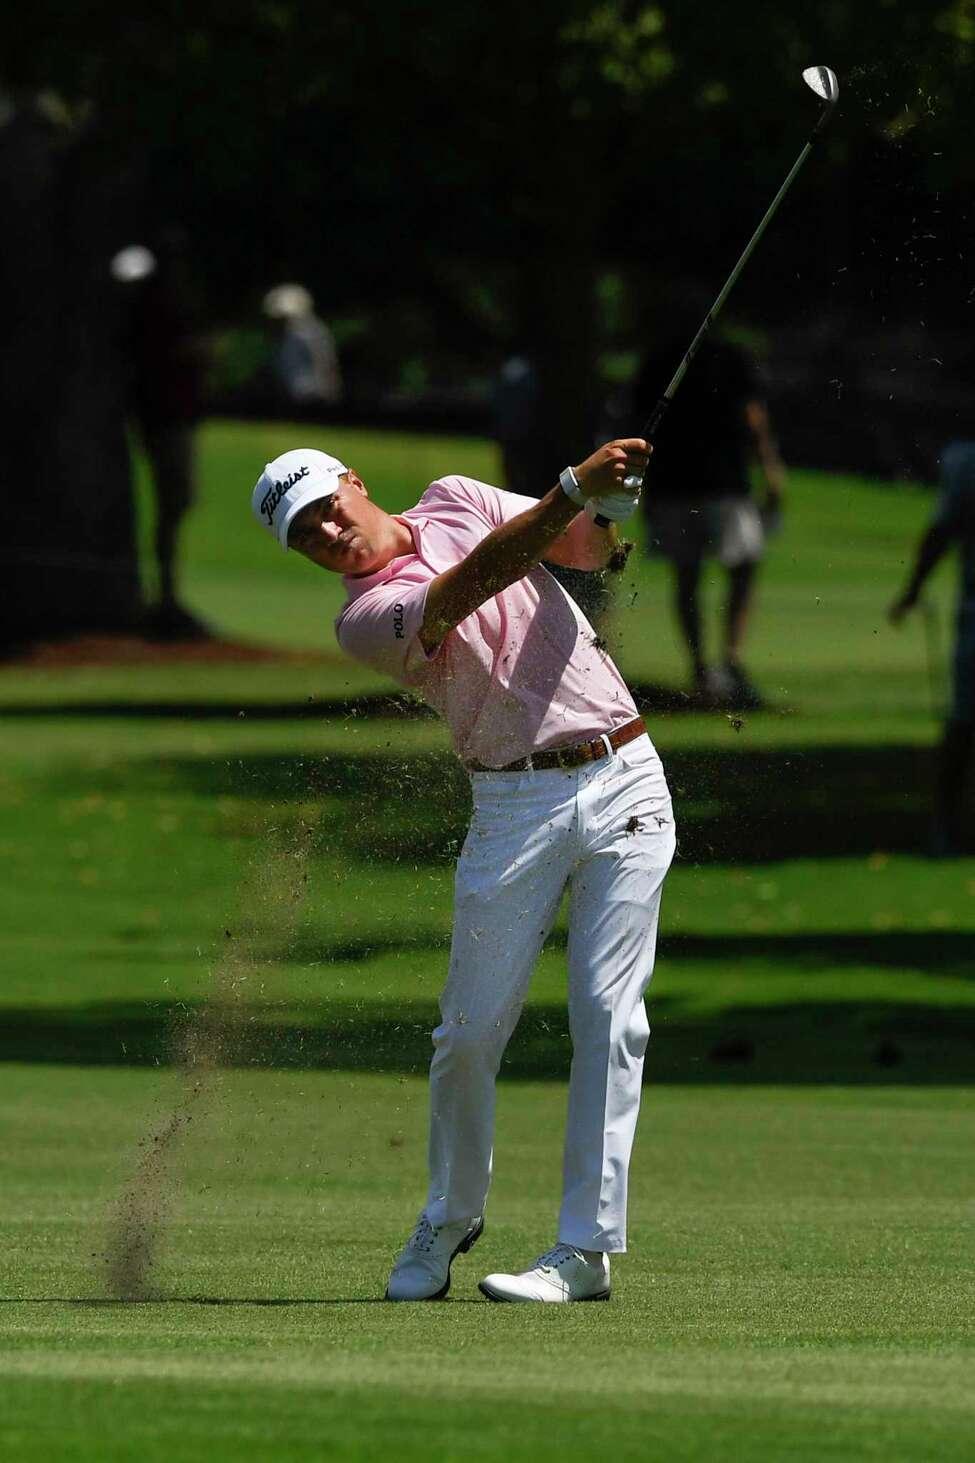 Justin Thomas hits from the third fairway during the first round of the Tour Championship golf tournament Thursday, Aug. 22, 2019, in Atlanta. (AP Photo/John Amis)